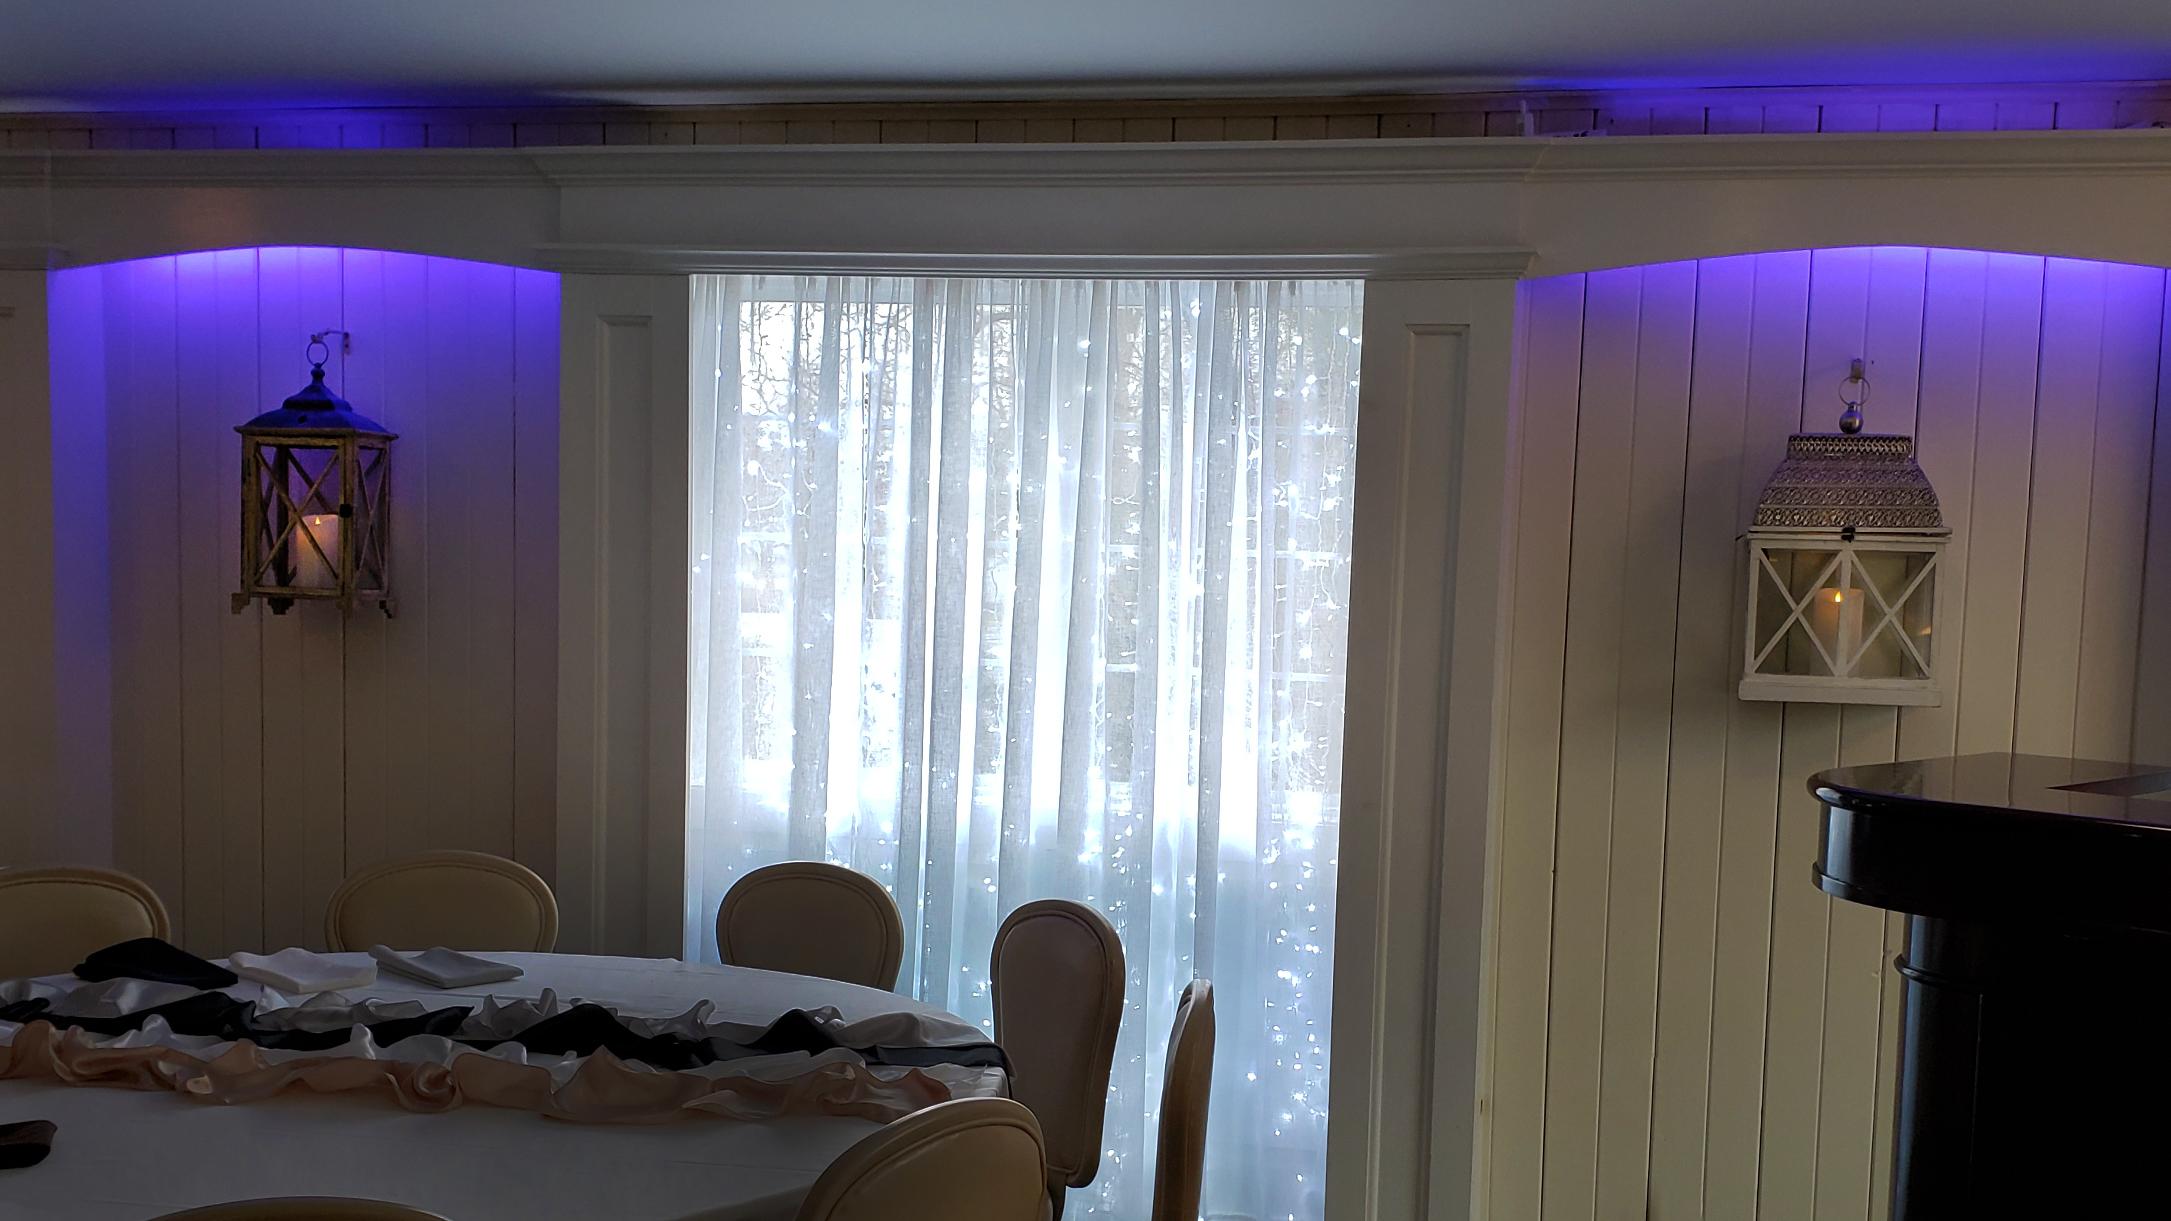 Window Fairy Lights & Wall Lighting (Color Customization)